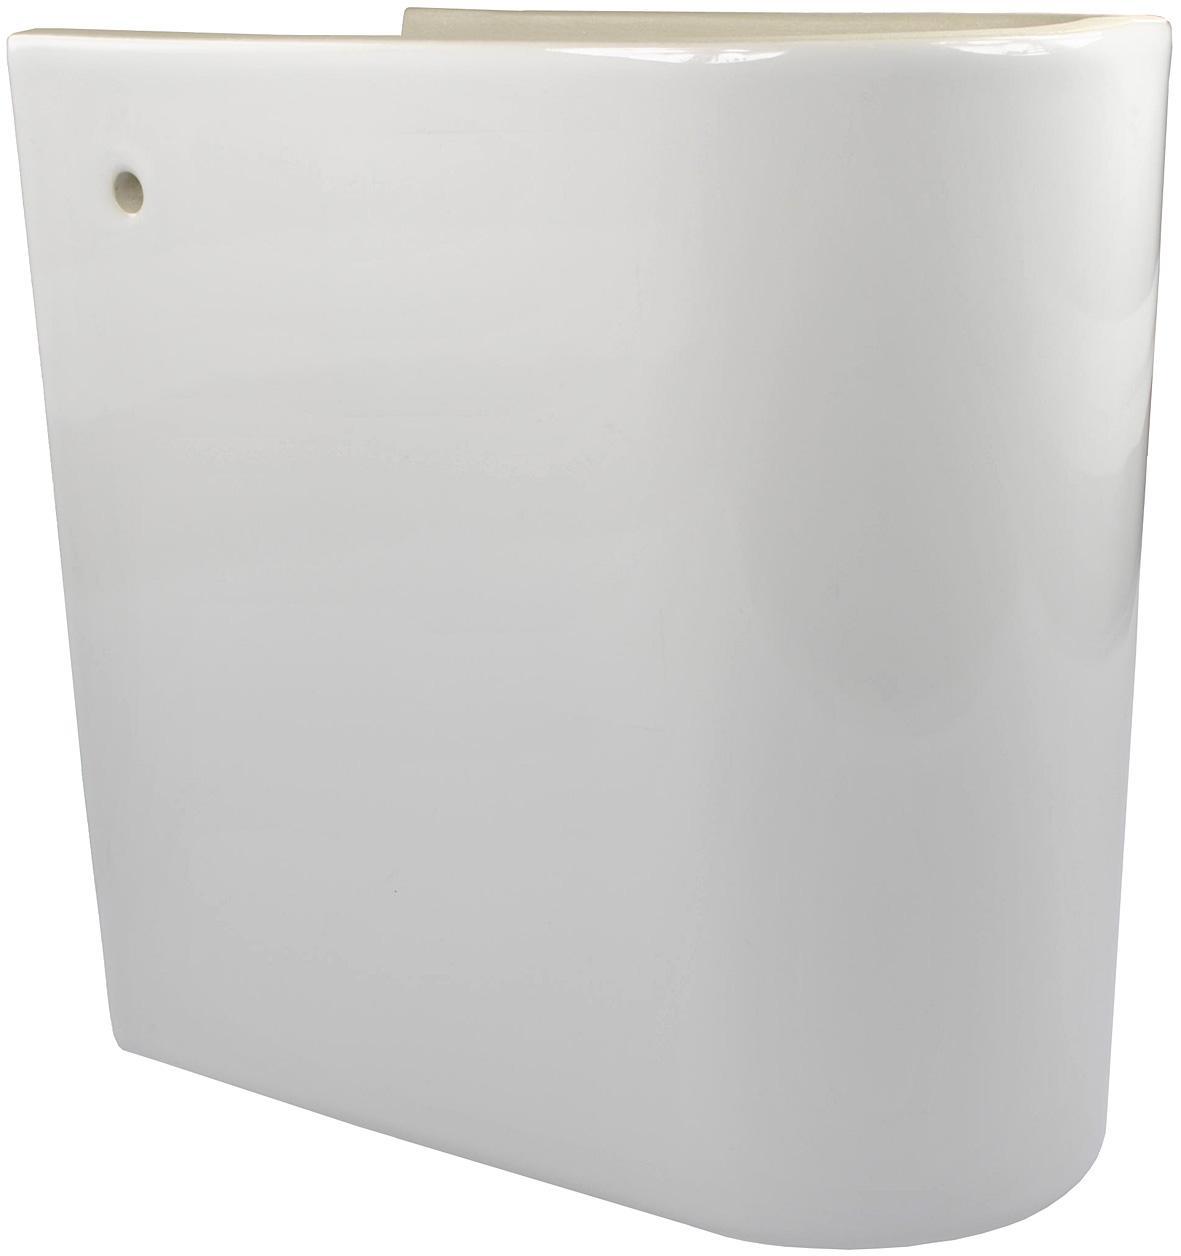 badshop veith | halbsäule zu handwaschbecken cosima inkl.befestigung